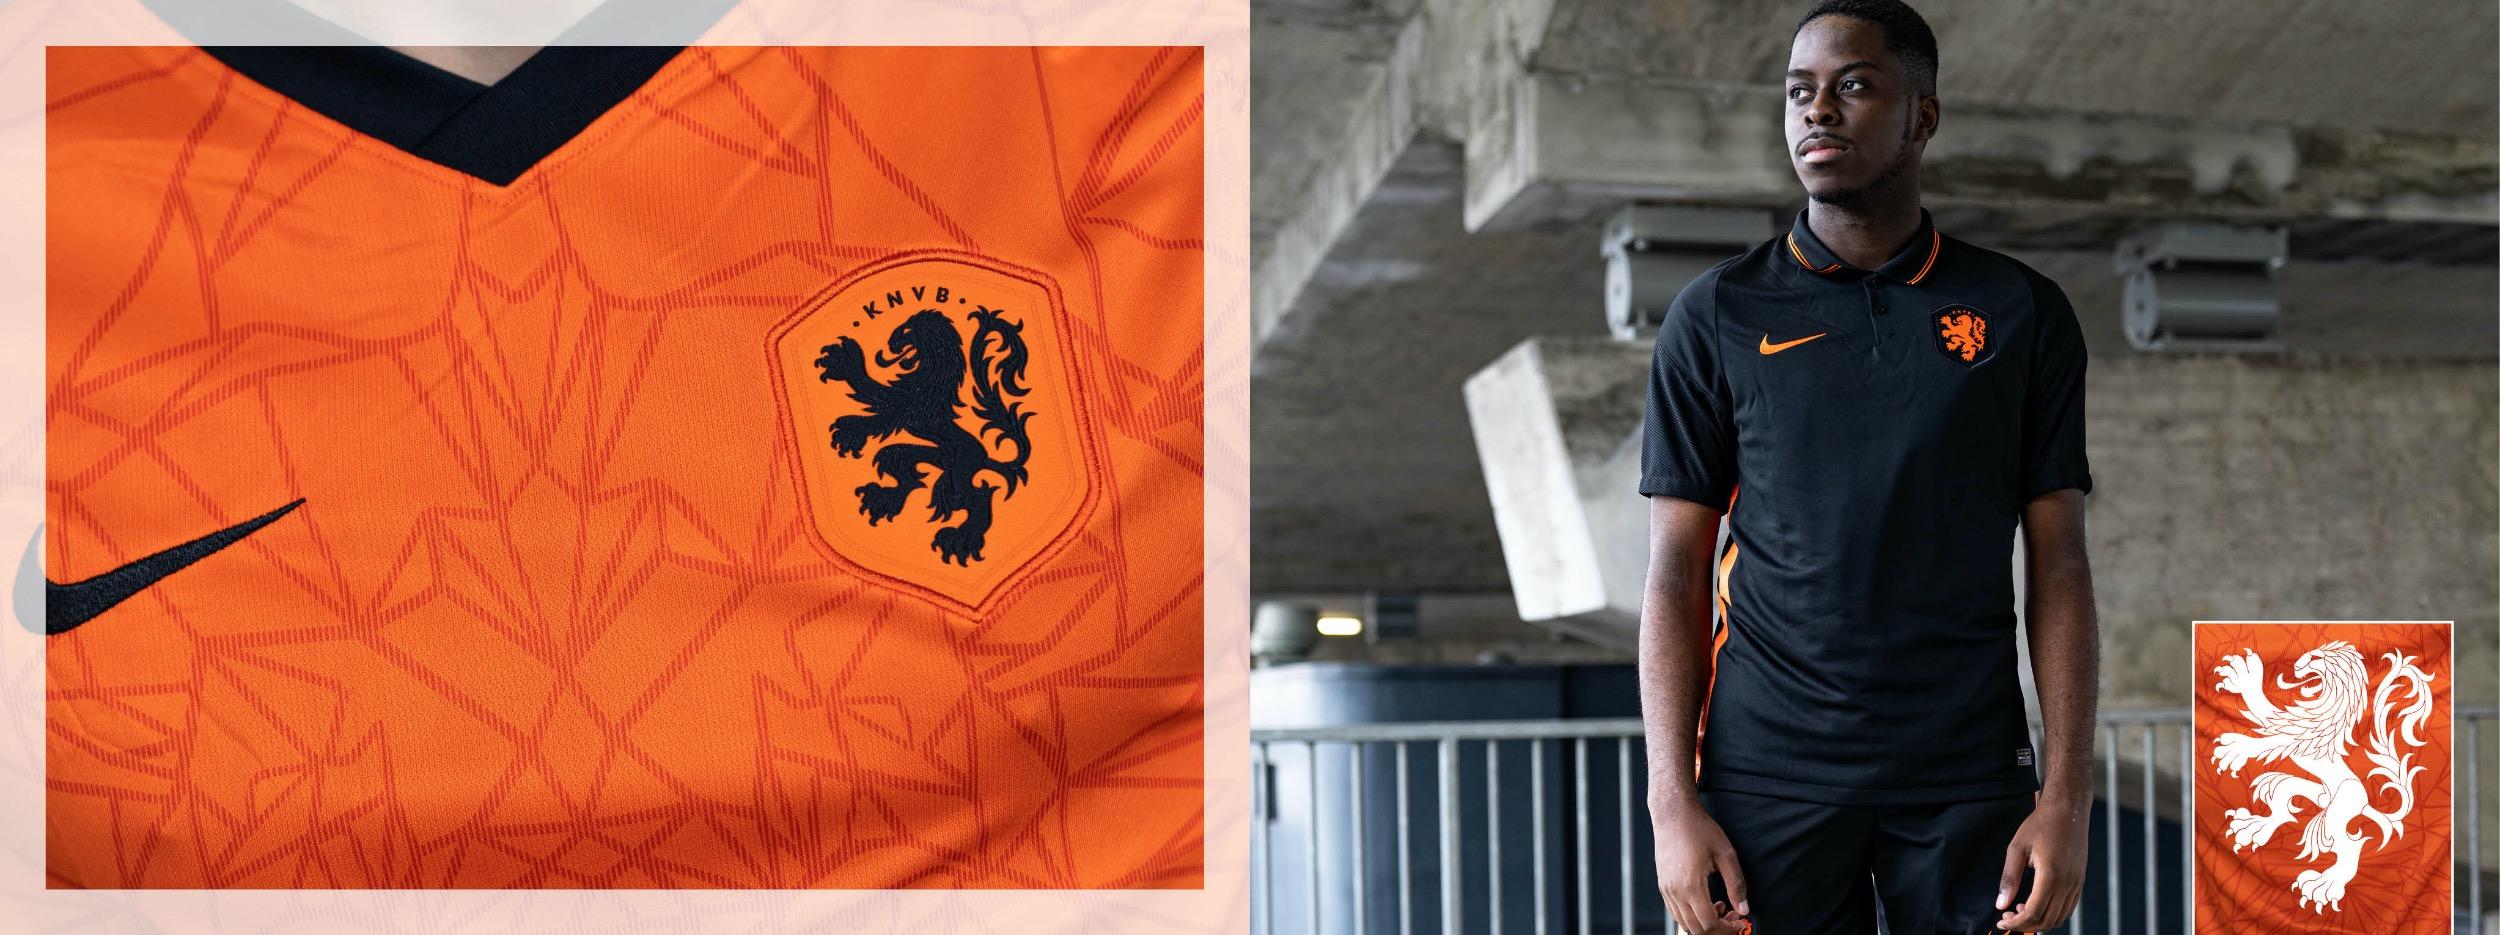 Nederlands Elftal - Euro 2020 collectie